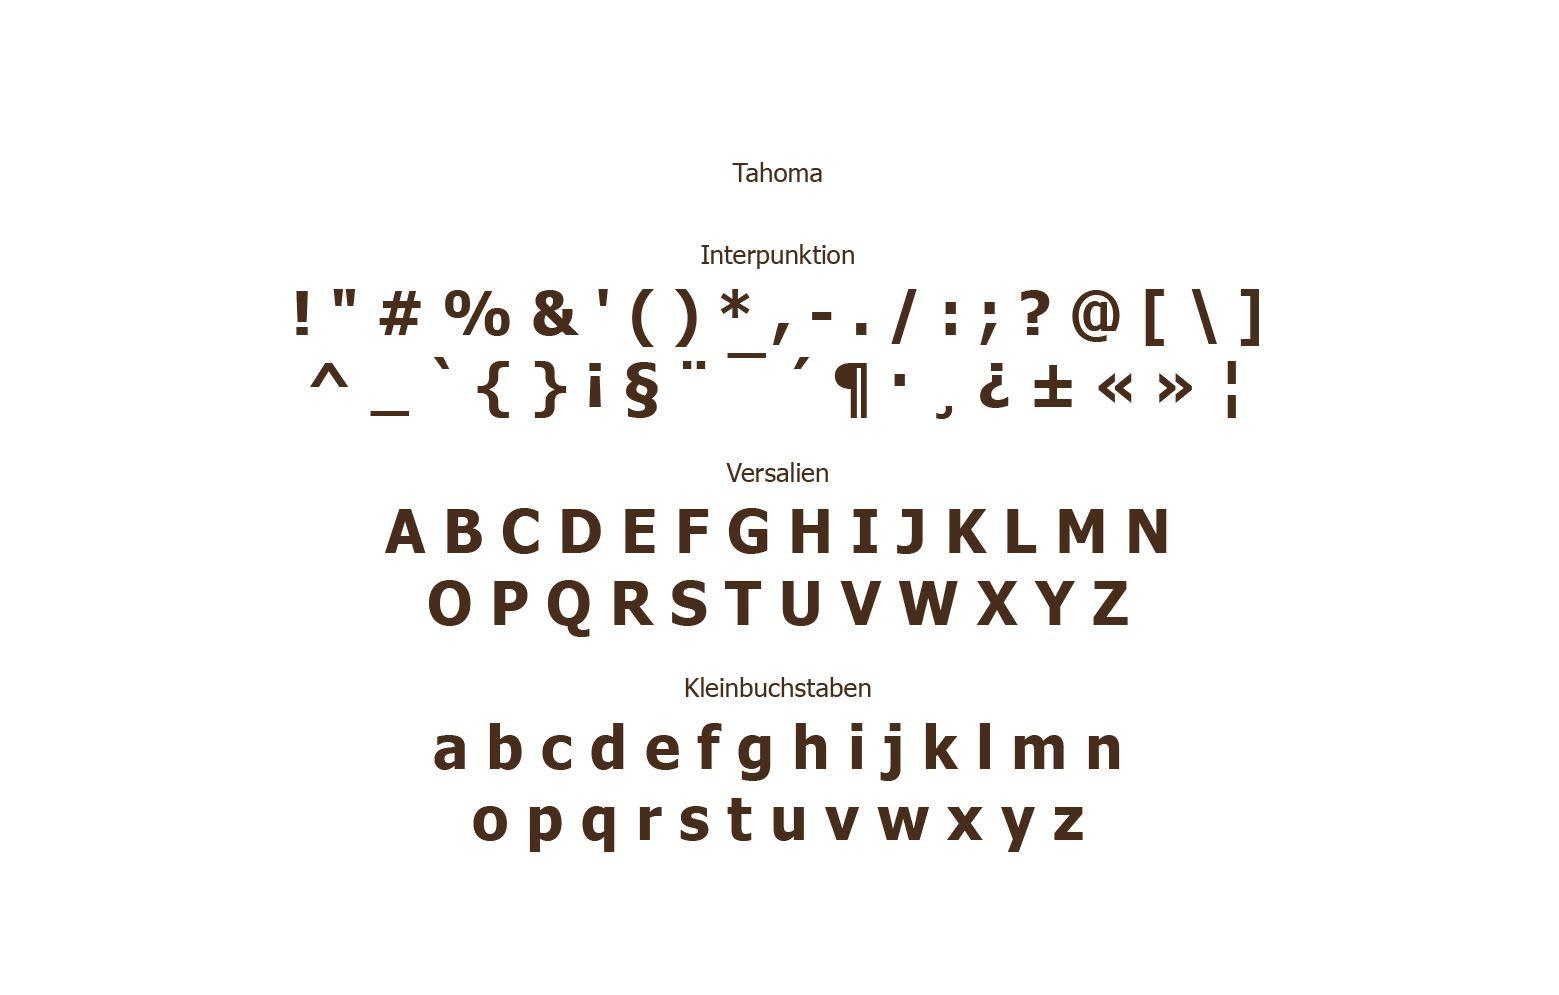 Typografie Tahoma von Kaffeemarke Black Soul